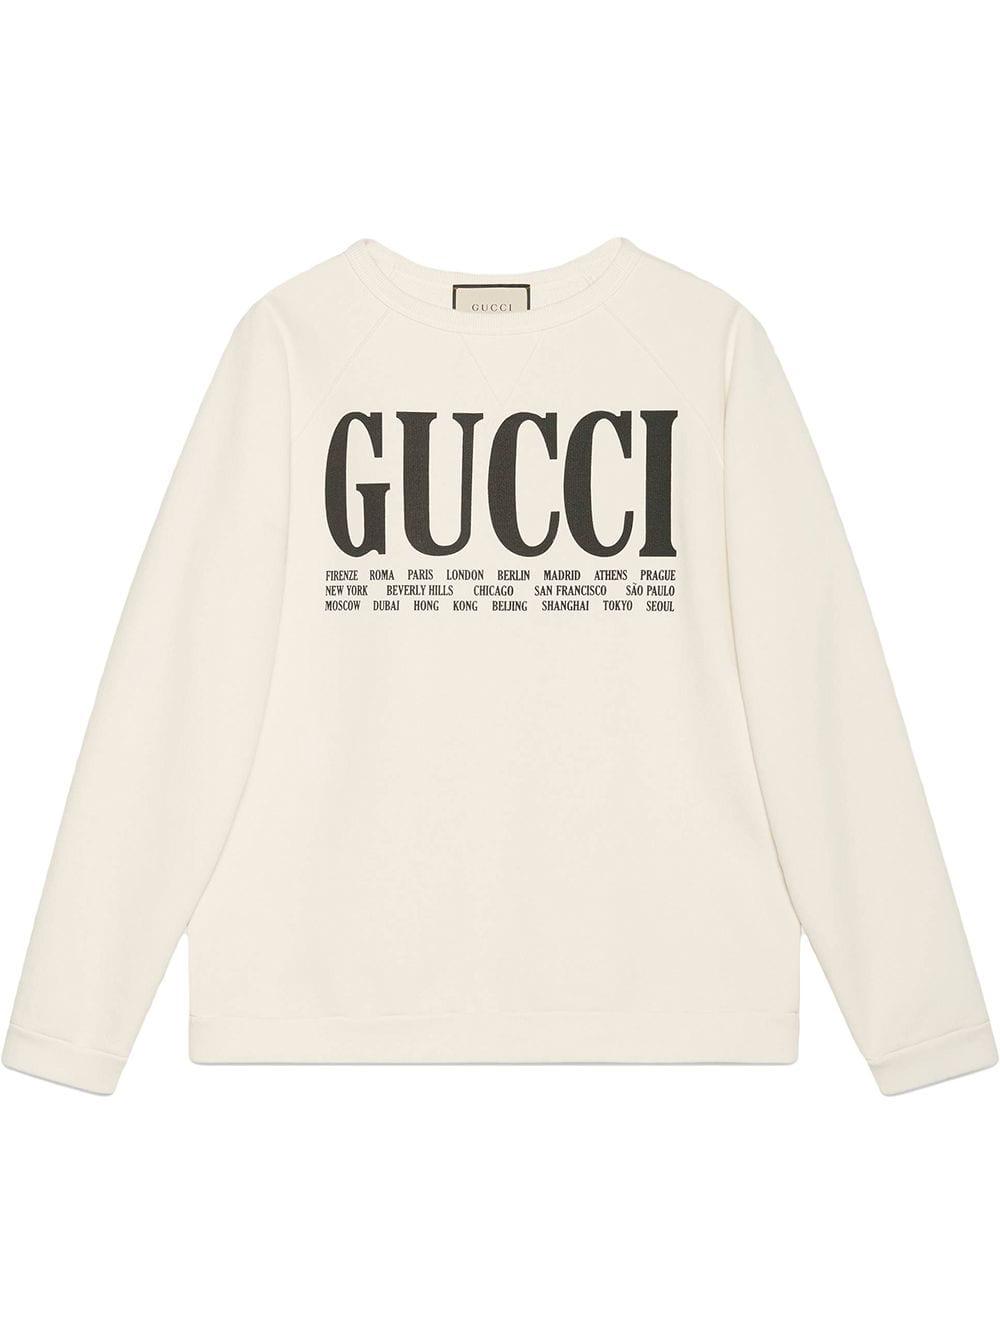 Gucci Gucci Cities Cotton Sweatshirt Farfetch Cotton Sweatshirts Sweatshirts Gucci [ 1334 x 1000 Pixel ]